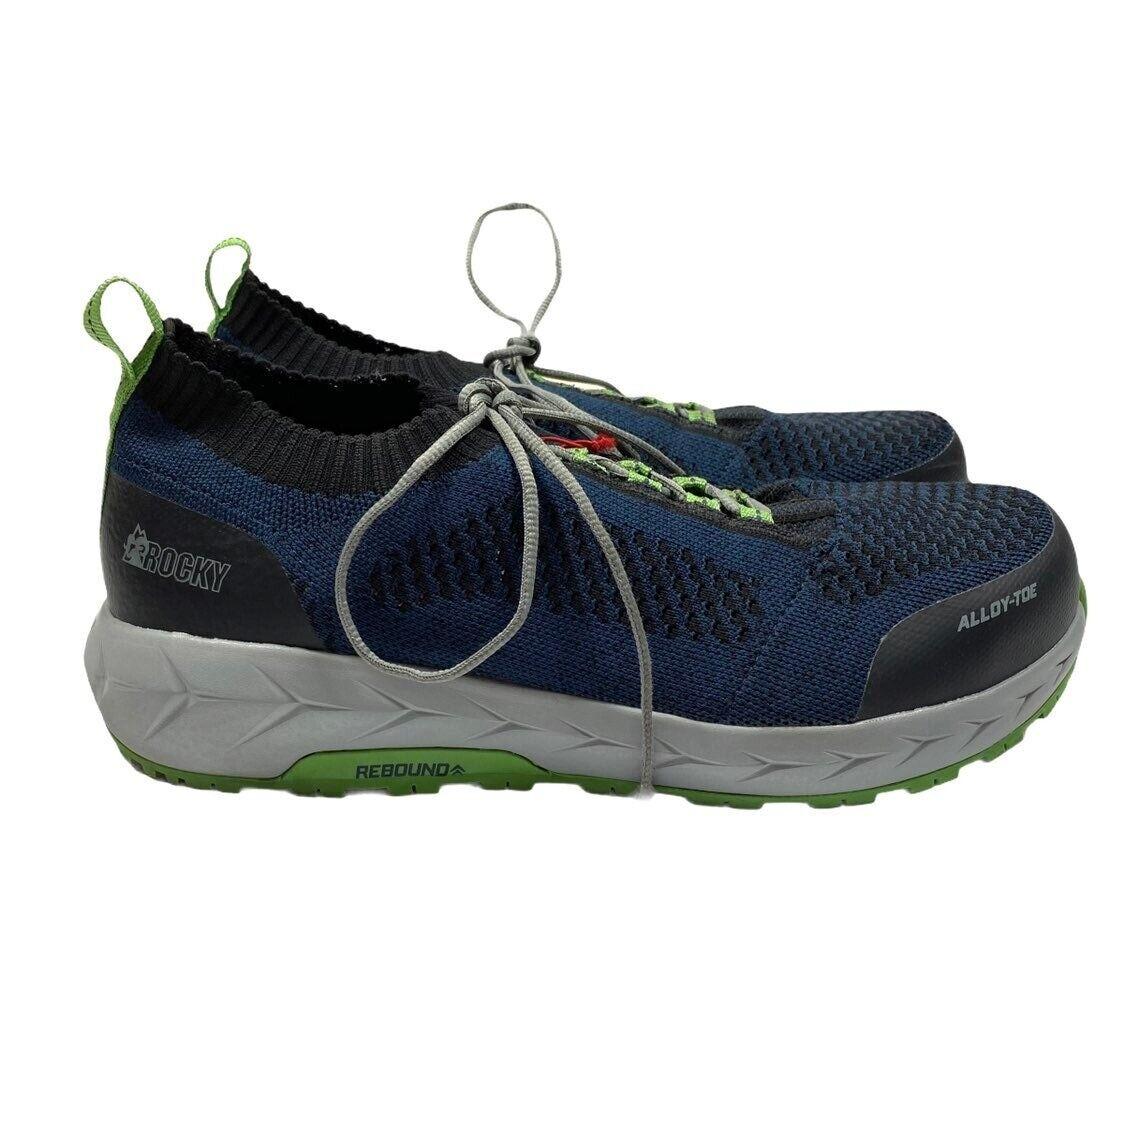 Rocky boots brand alloy toe athletic shoes men's 9.5 blue knit lace up euc